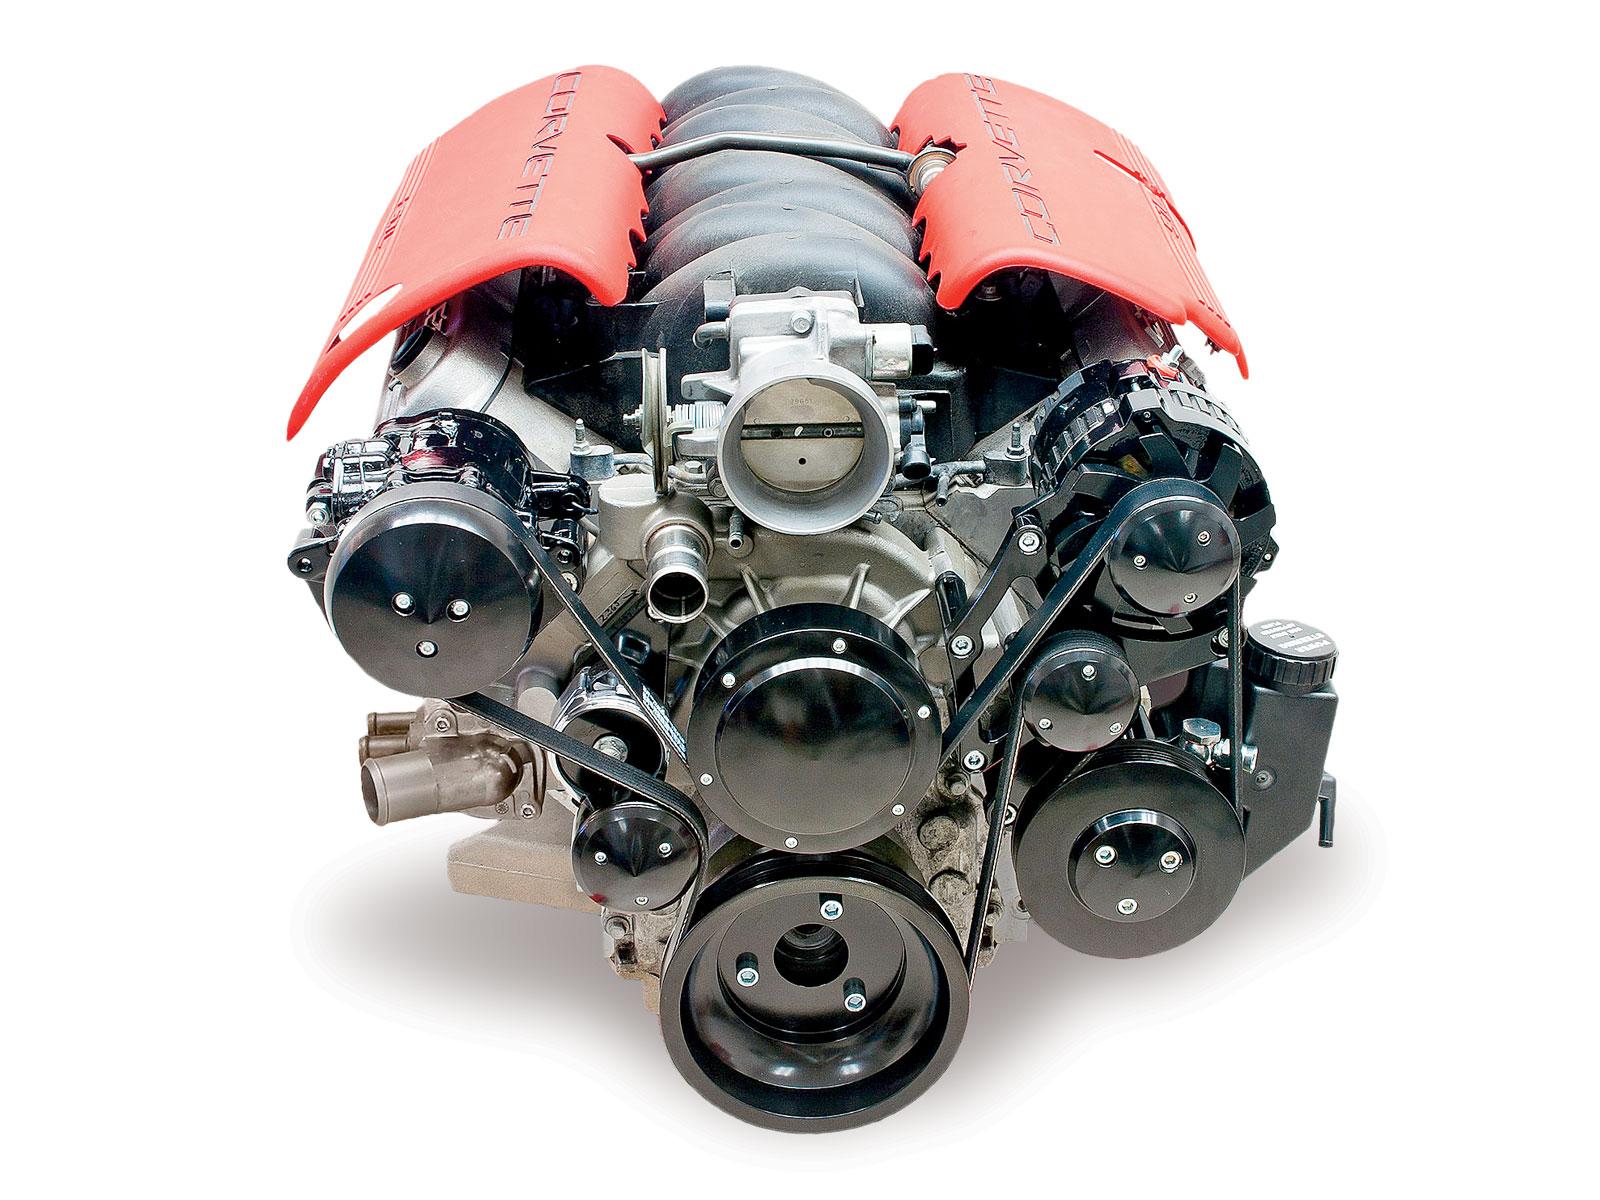 001-what-is-piston-slap-je-pistons